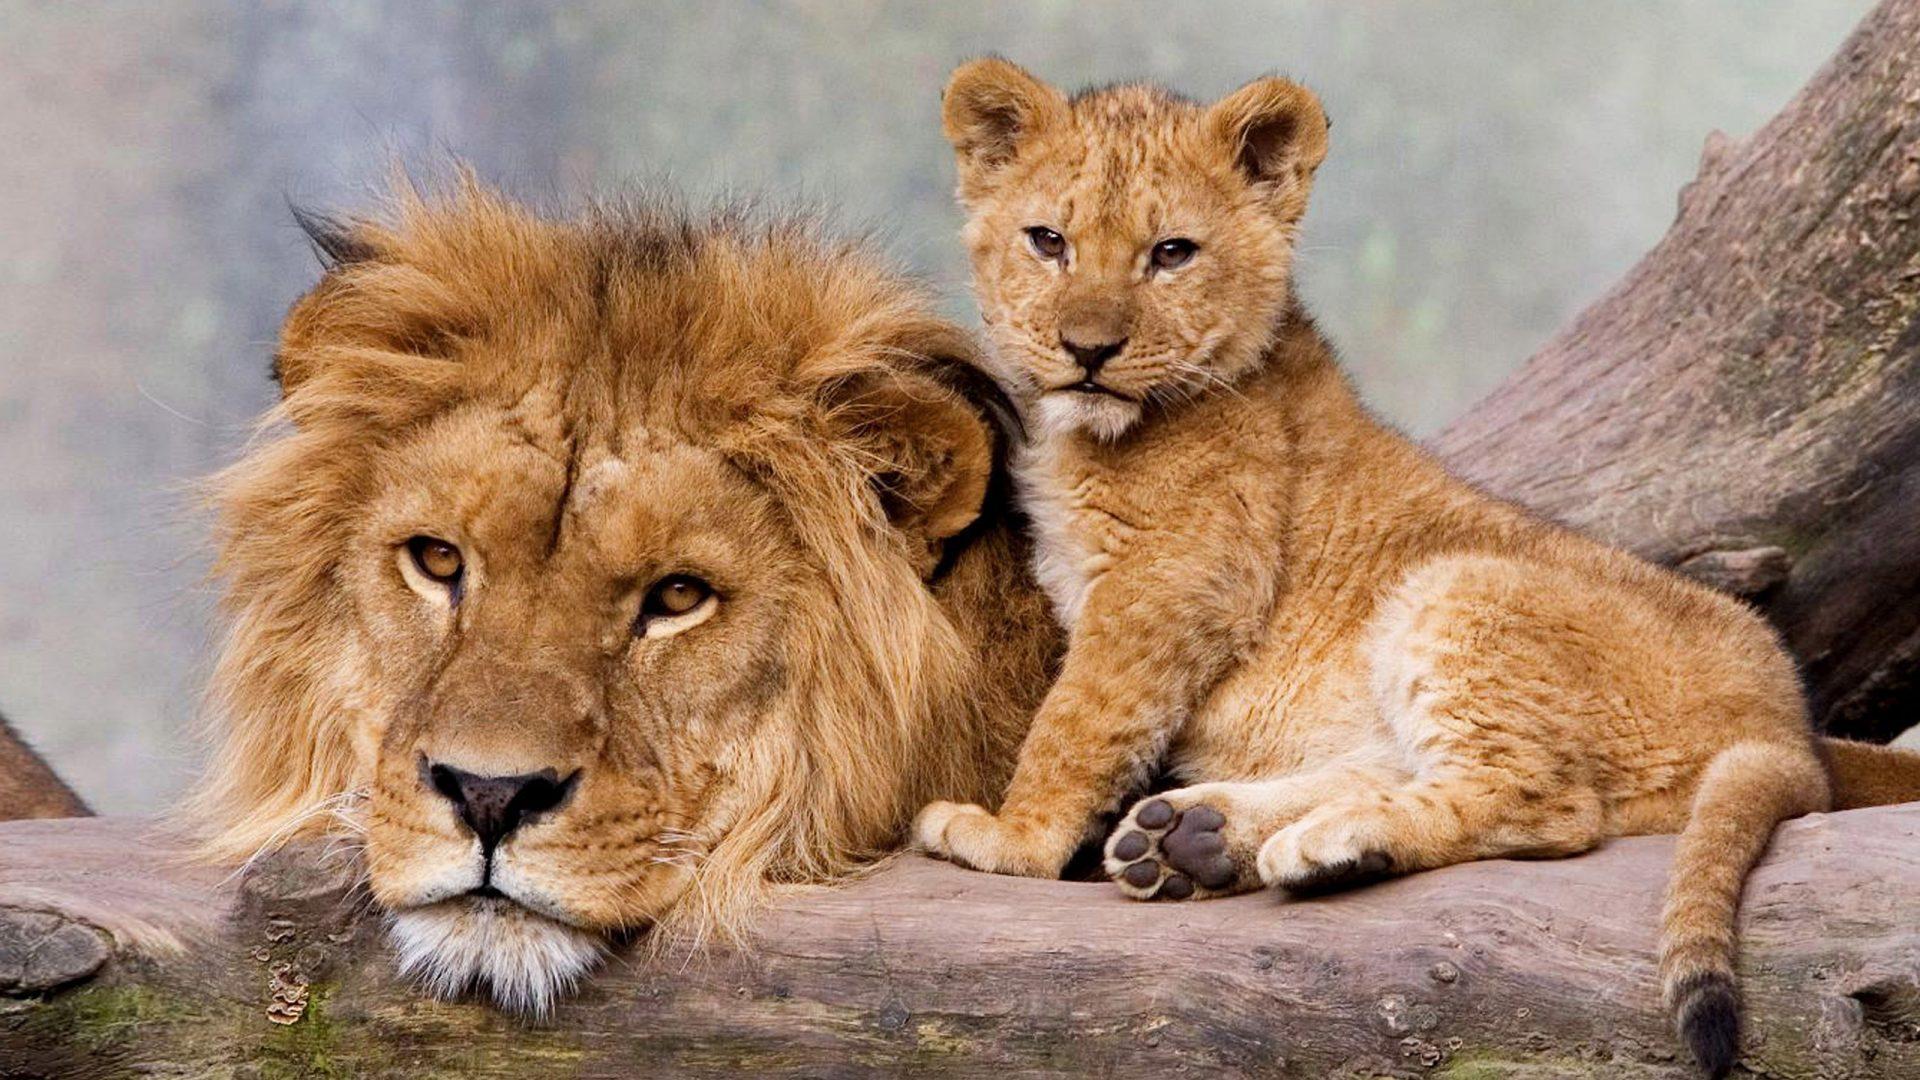 Lion with his Cub Fond d'écran HD | Arrière-Plan | 1920x1080 | ID:700952 - Wallpaper Abyss